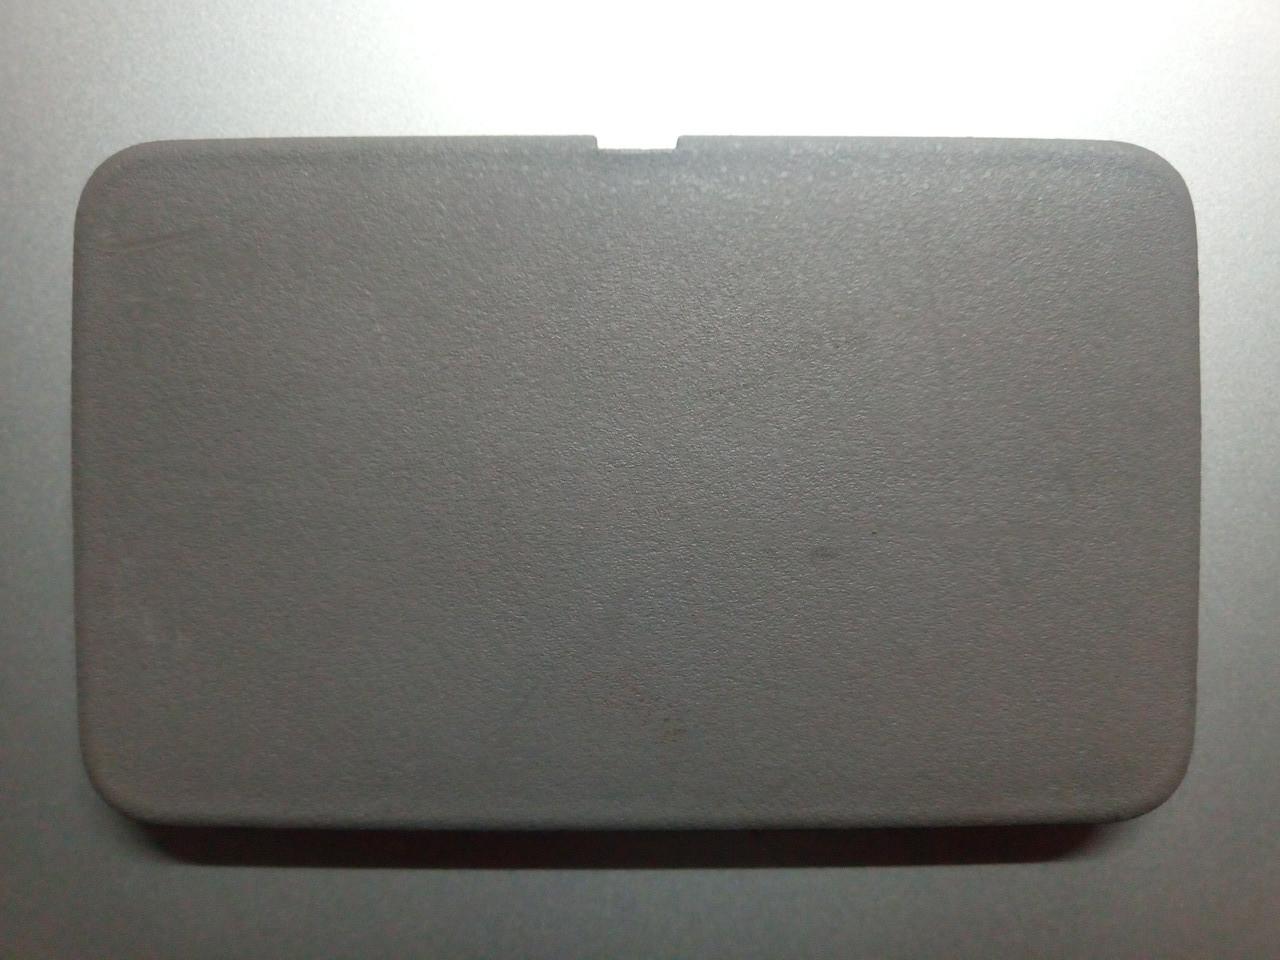 Накладка багажника левая нижняя пластик MR951973 994400 Grandis Mitsubishi